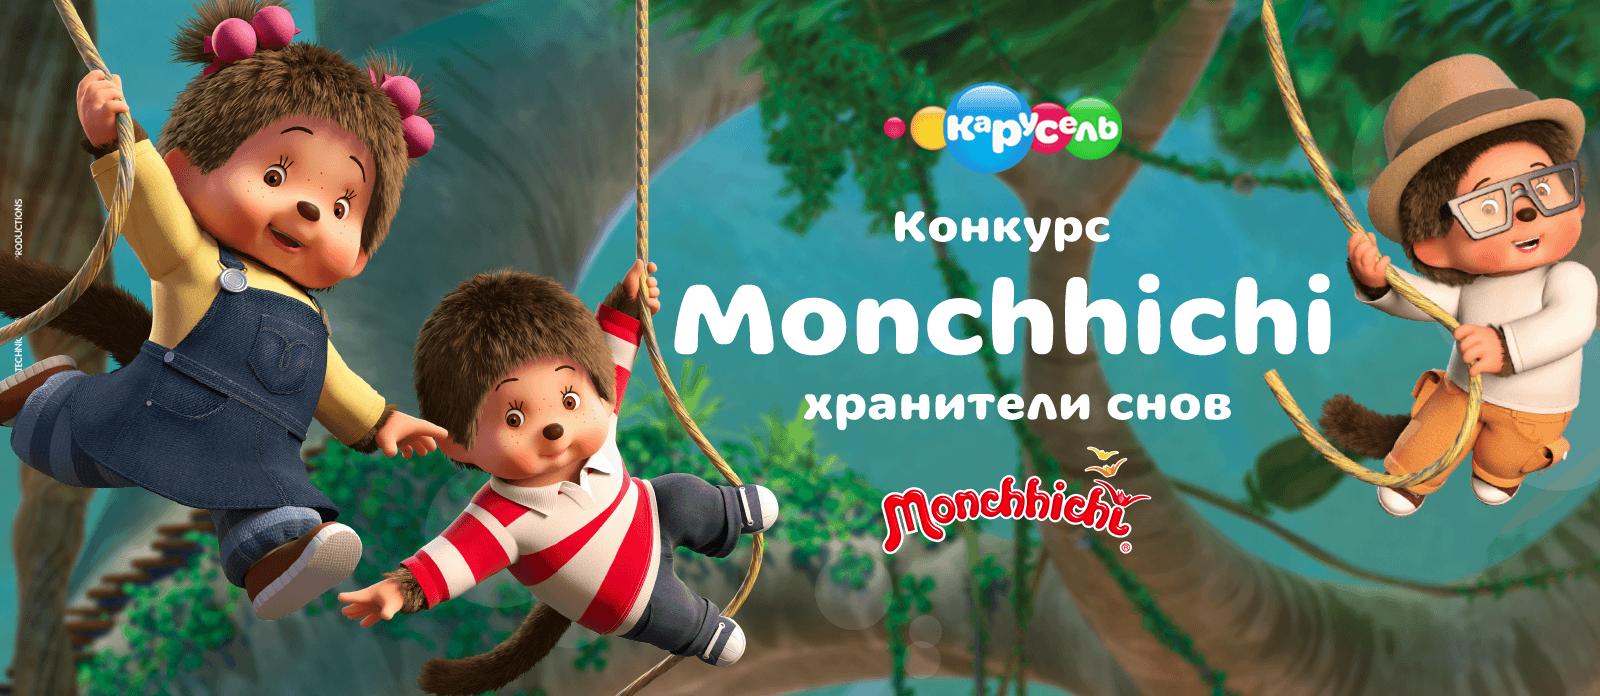 Monchhichi – хранители снов